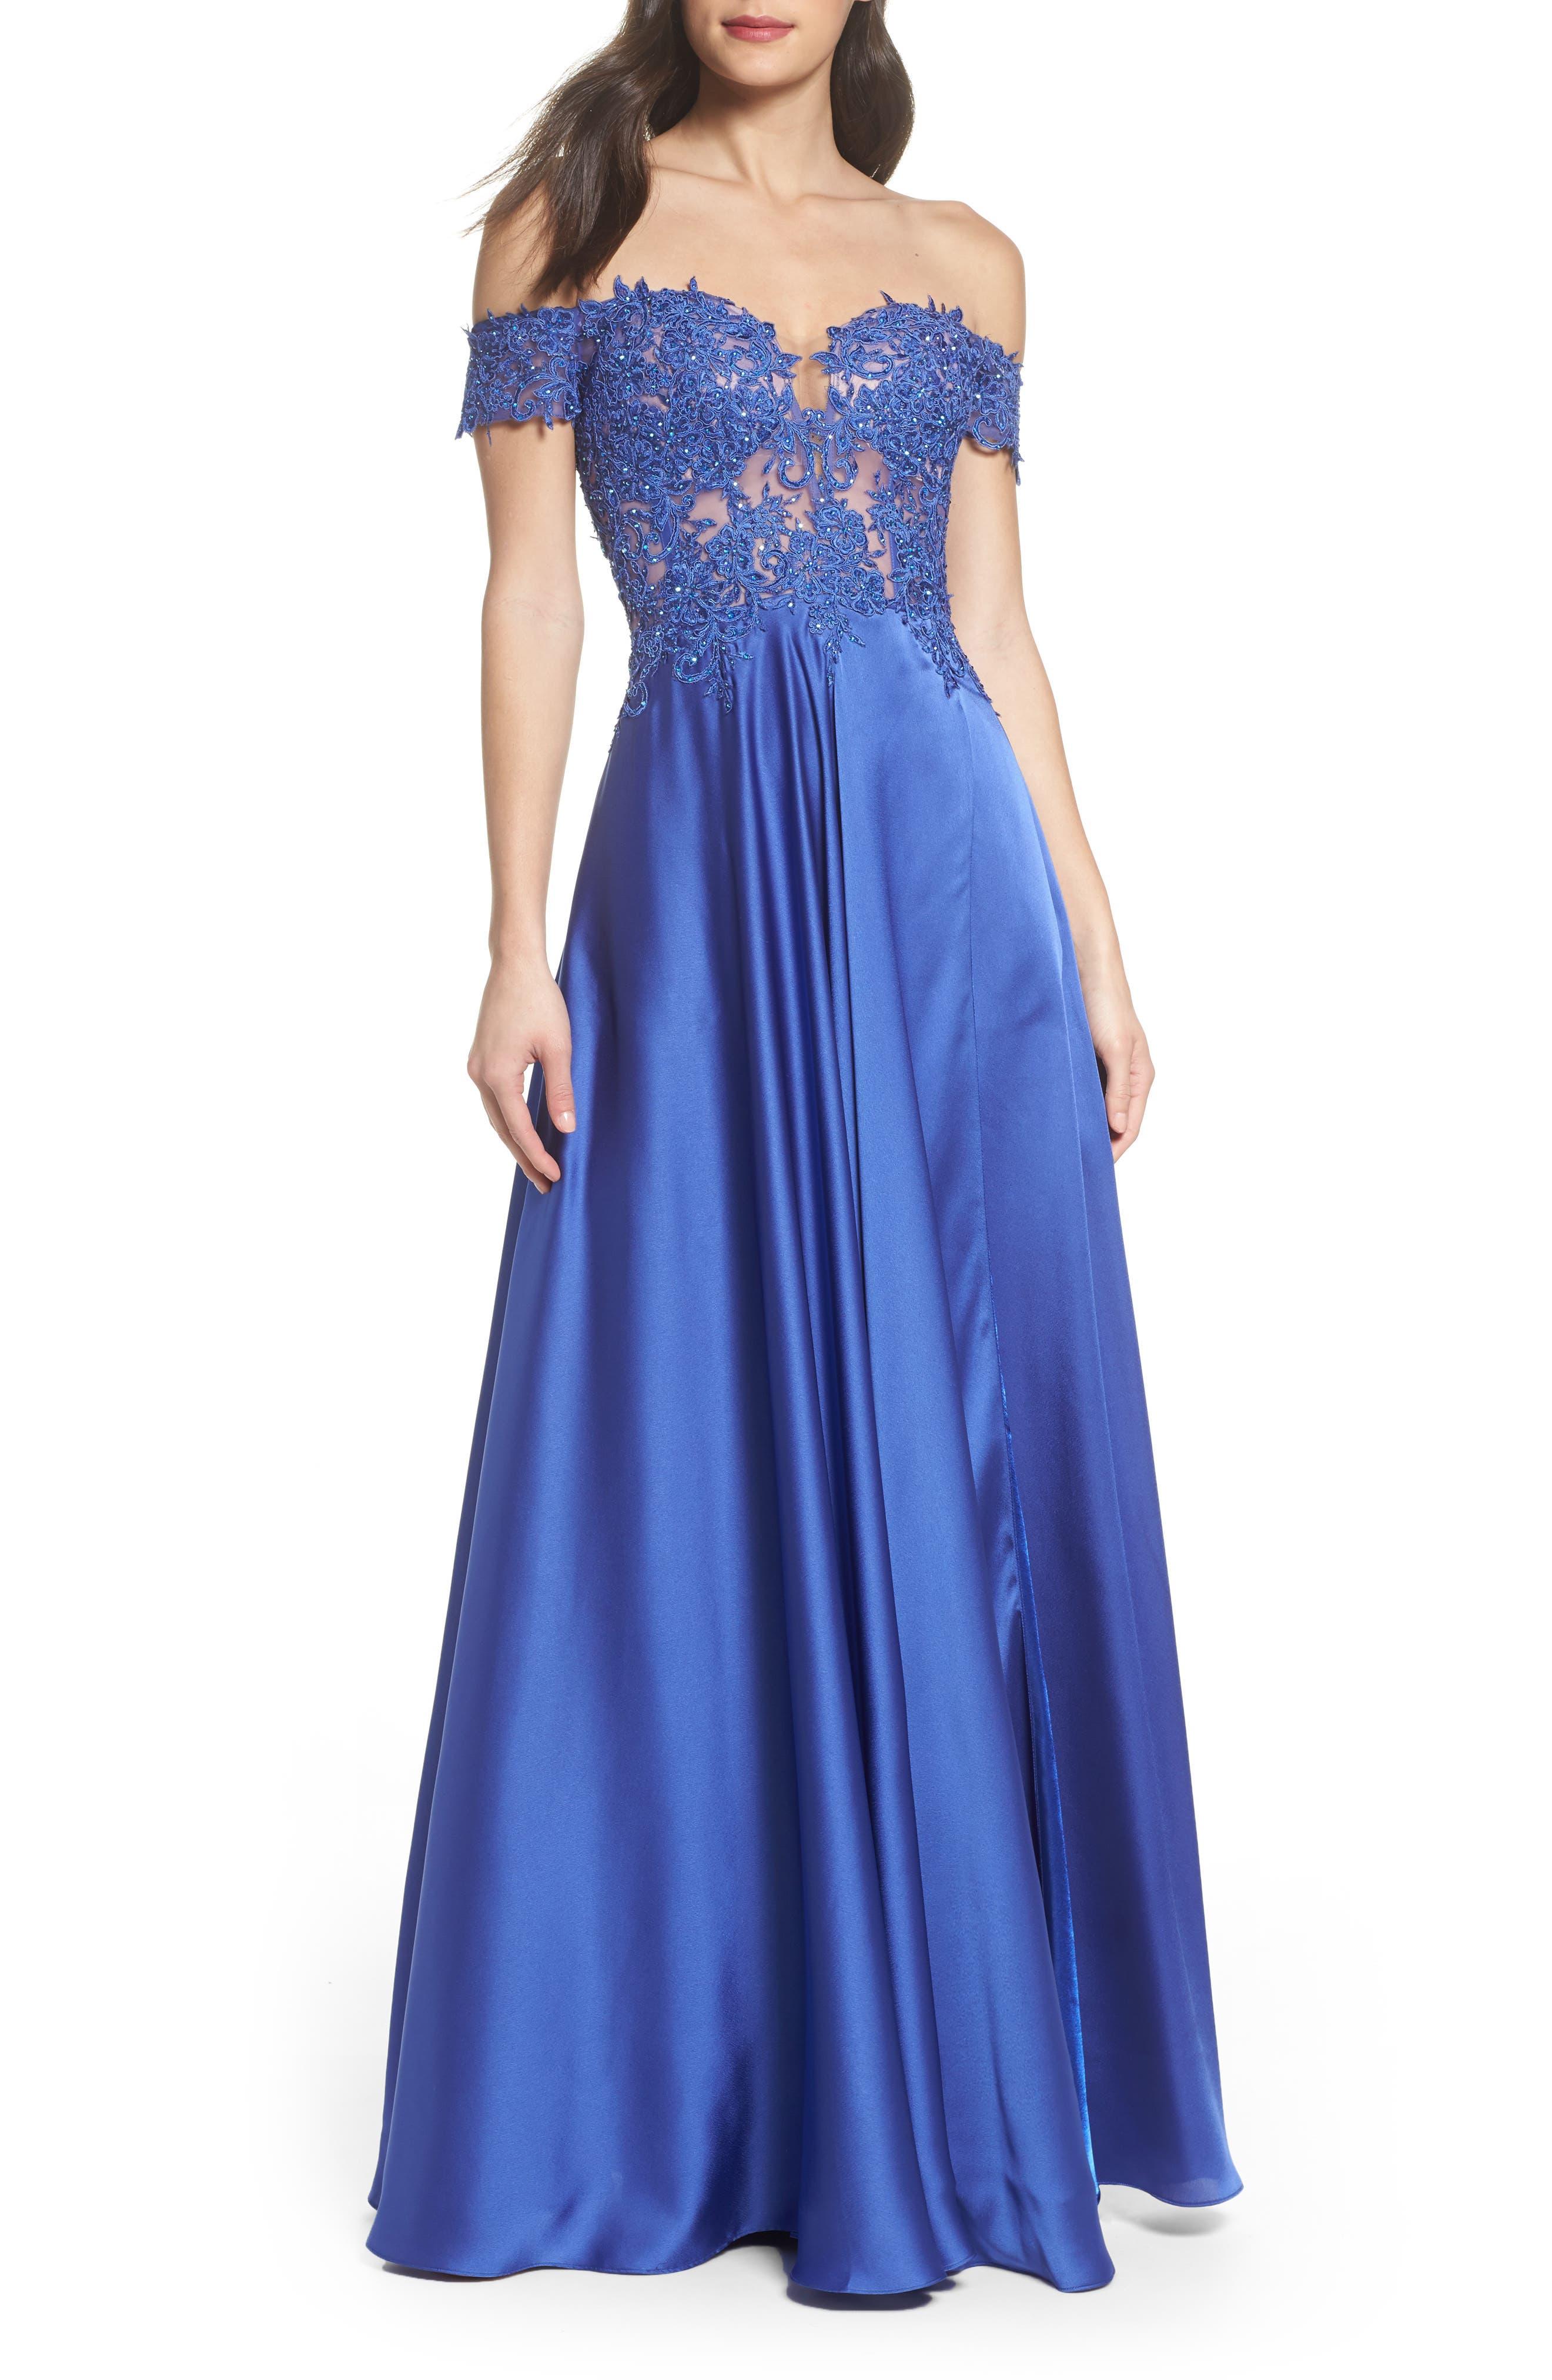 Main Image - La Femme Embroidered Off the Shoulder Satin A-Line Gown